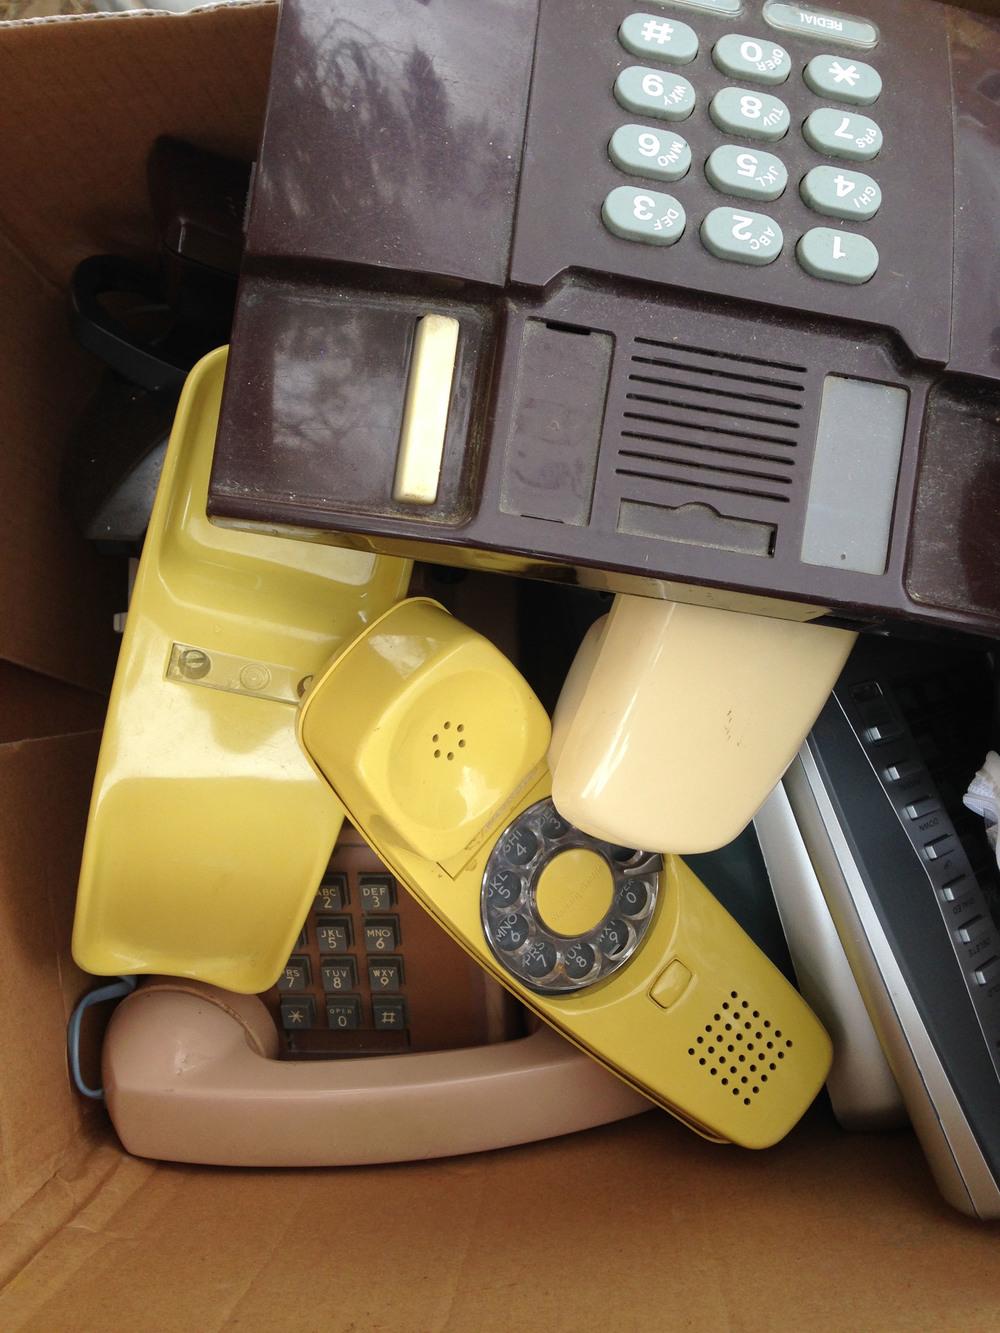 Old phones.